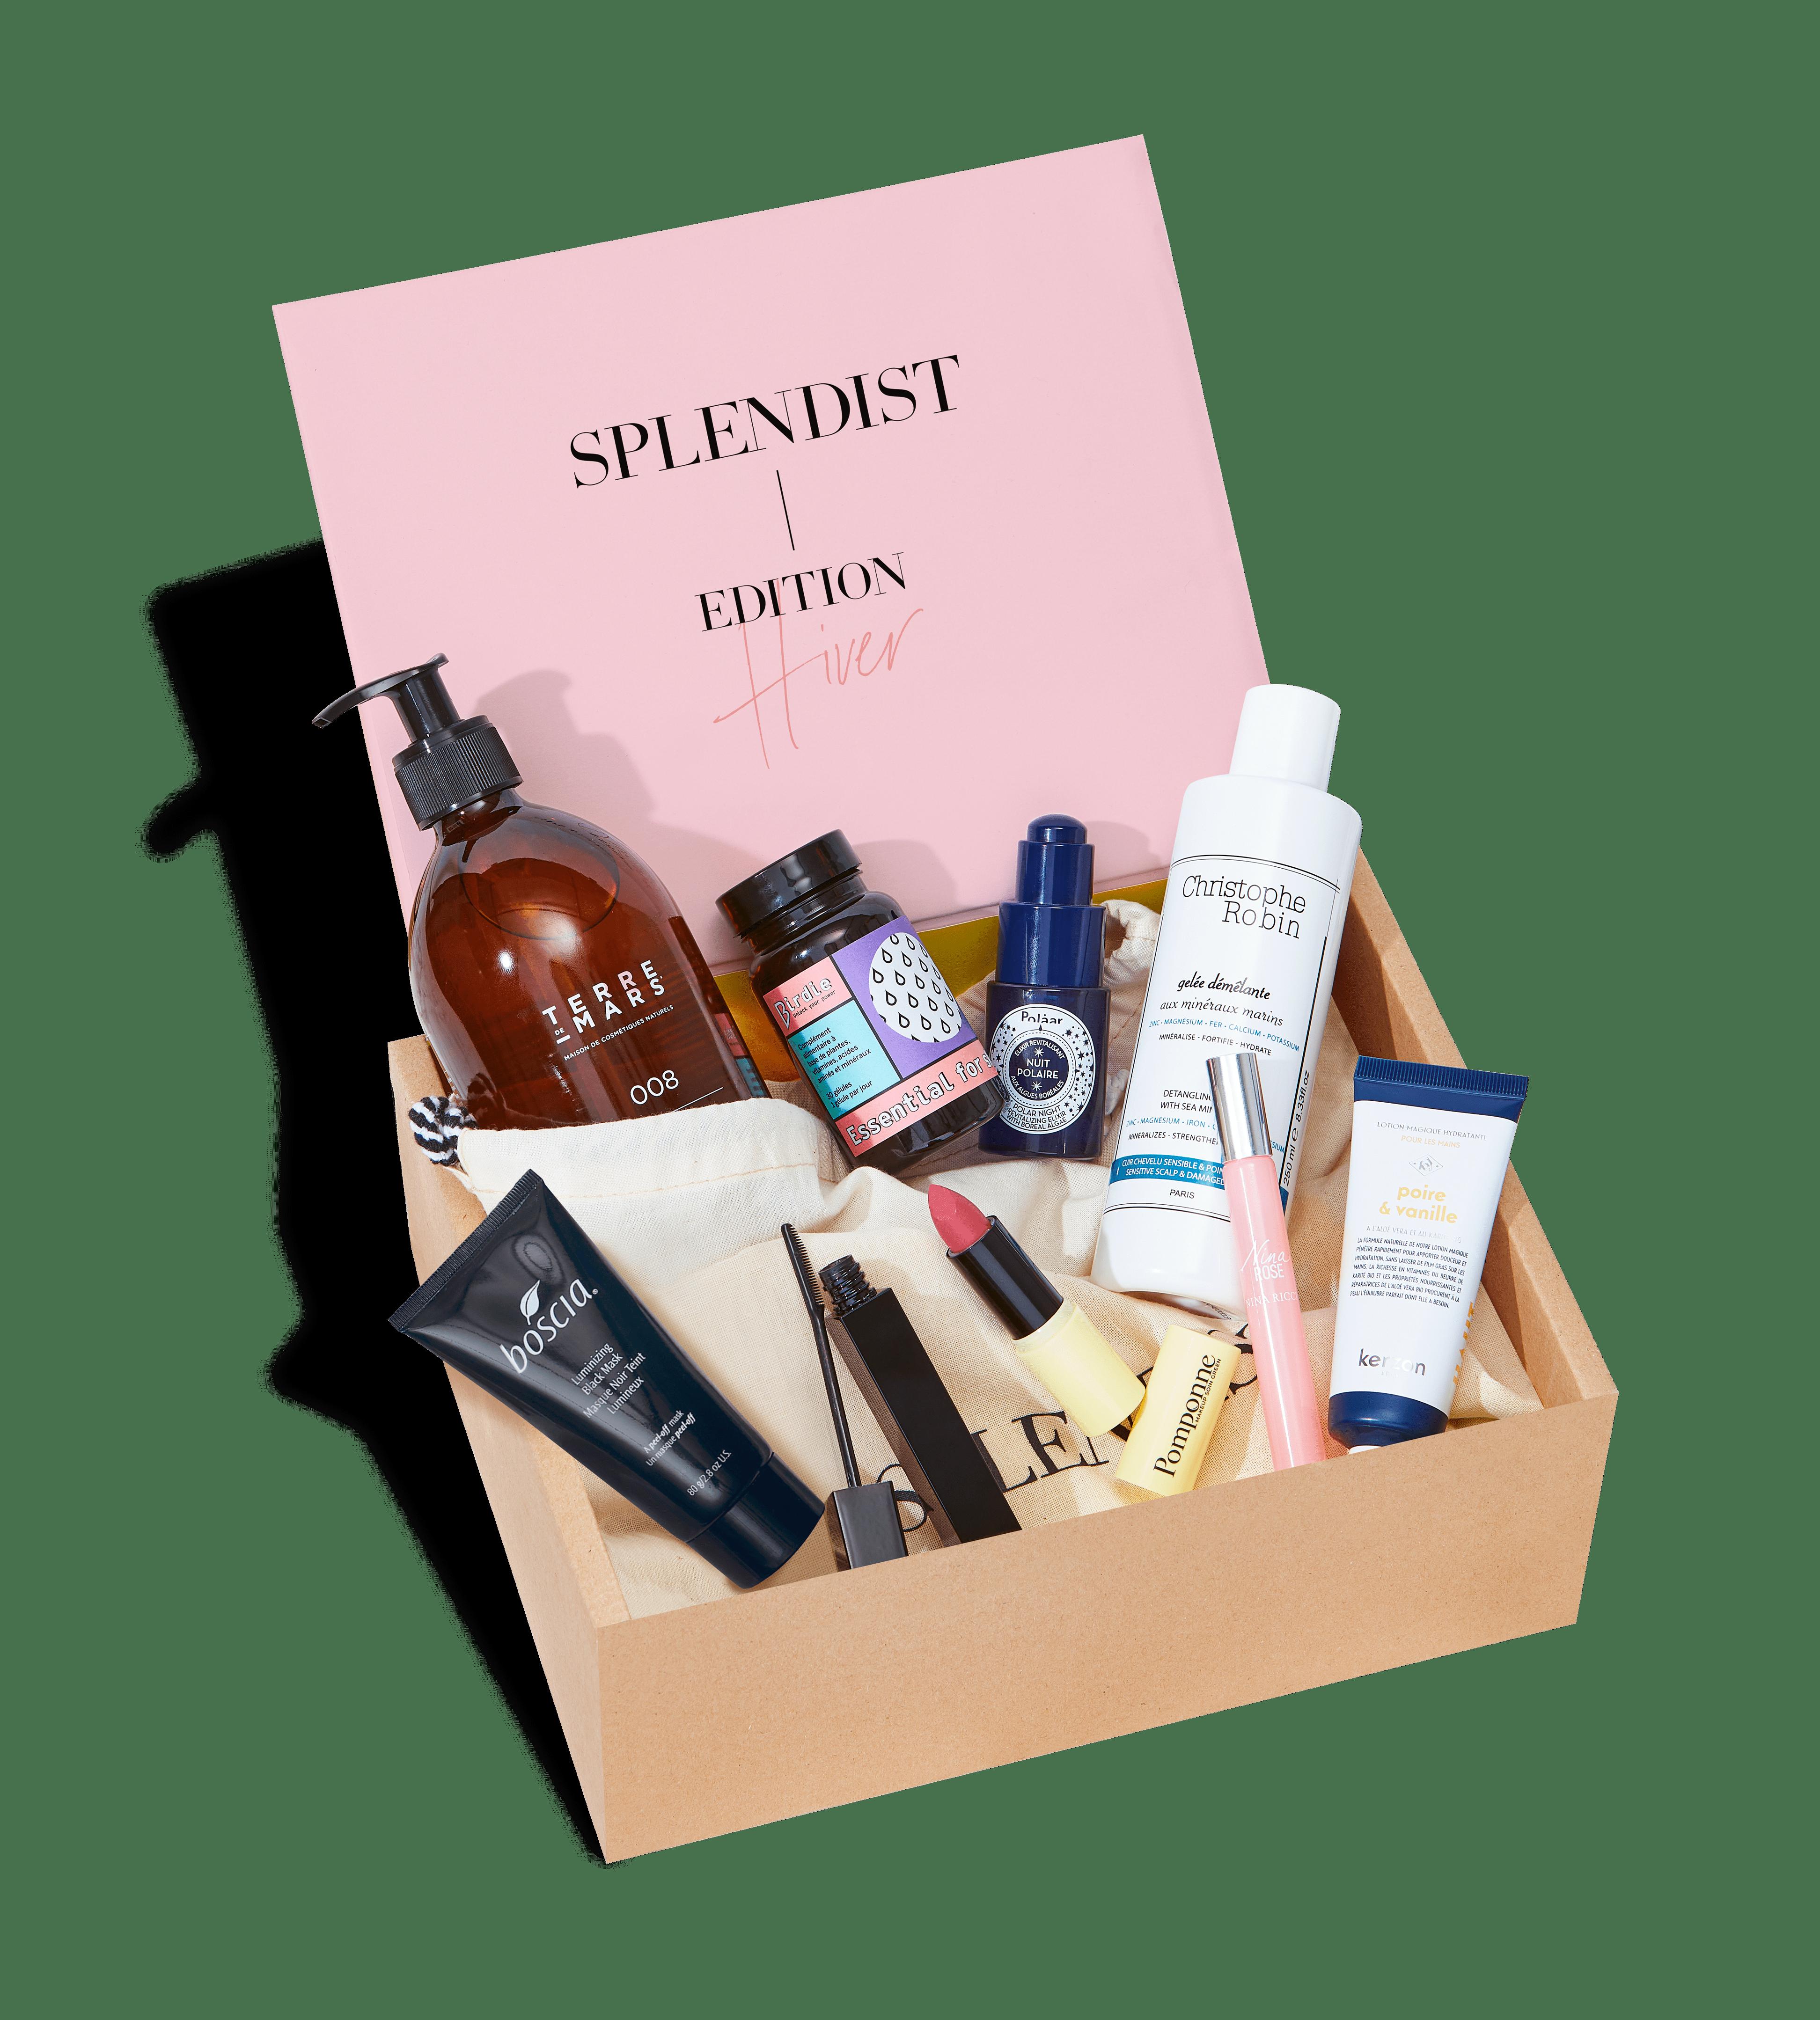 packshot de la box Splendist